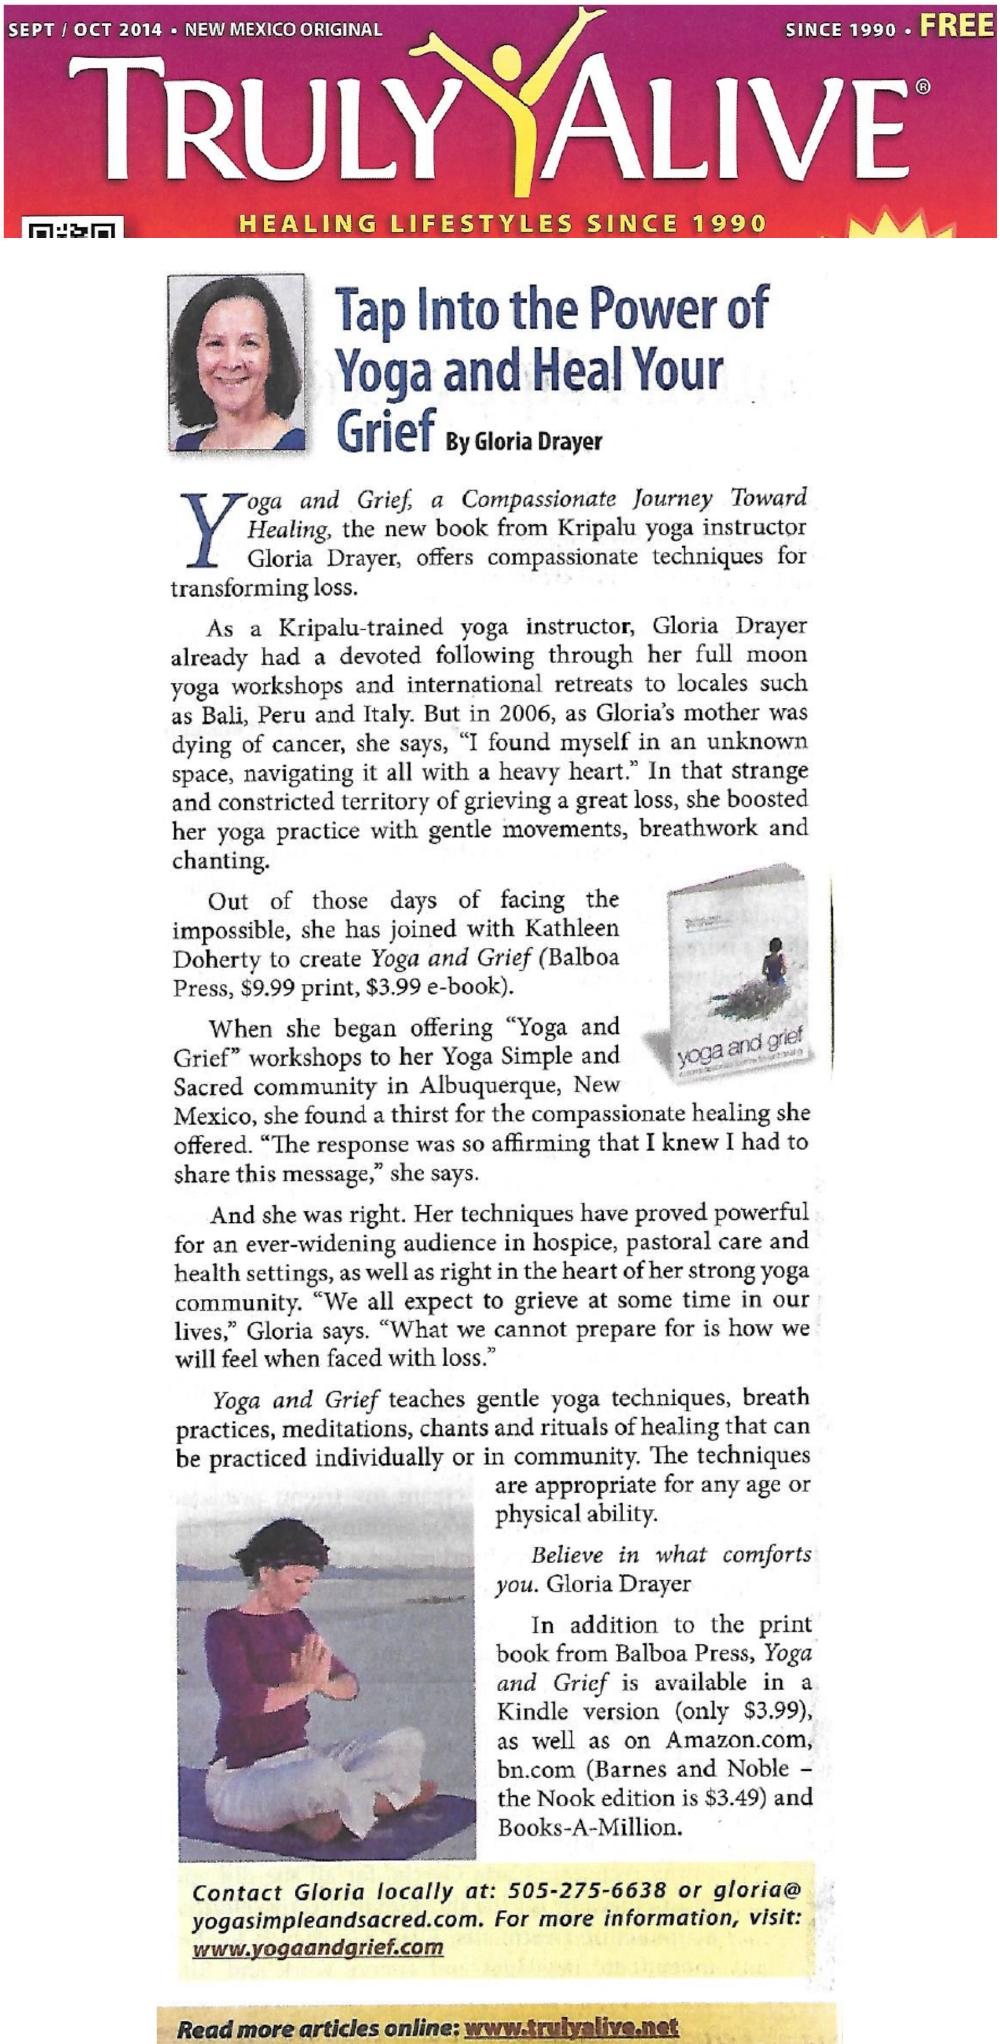 TA-article httpwww.trulyalive.nettap-power-yoga-heal-grief